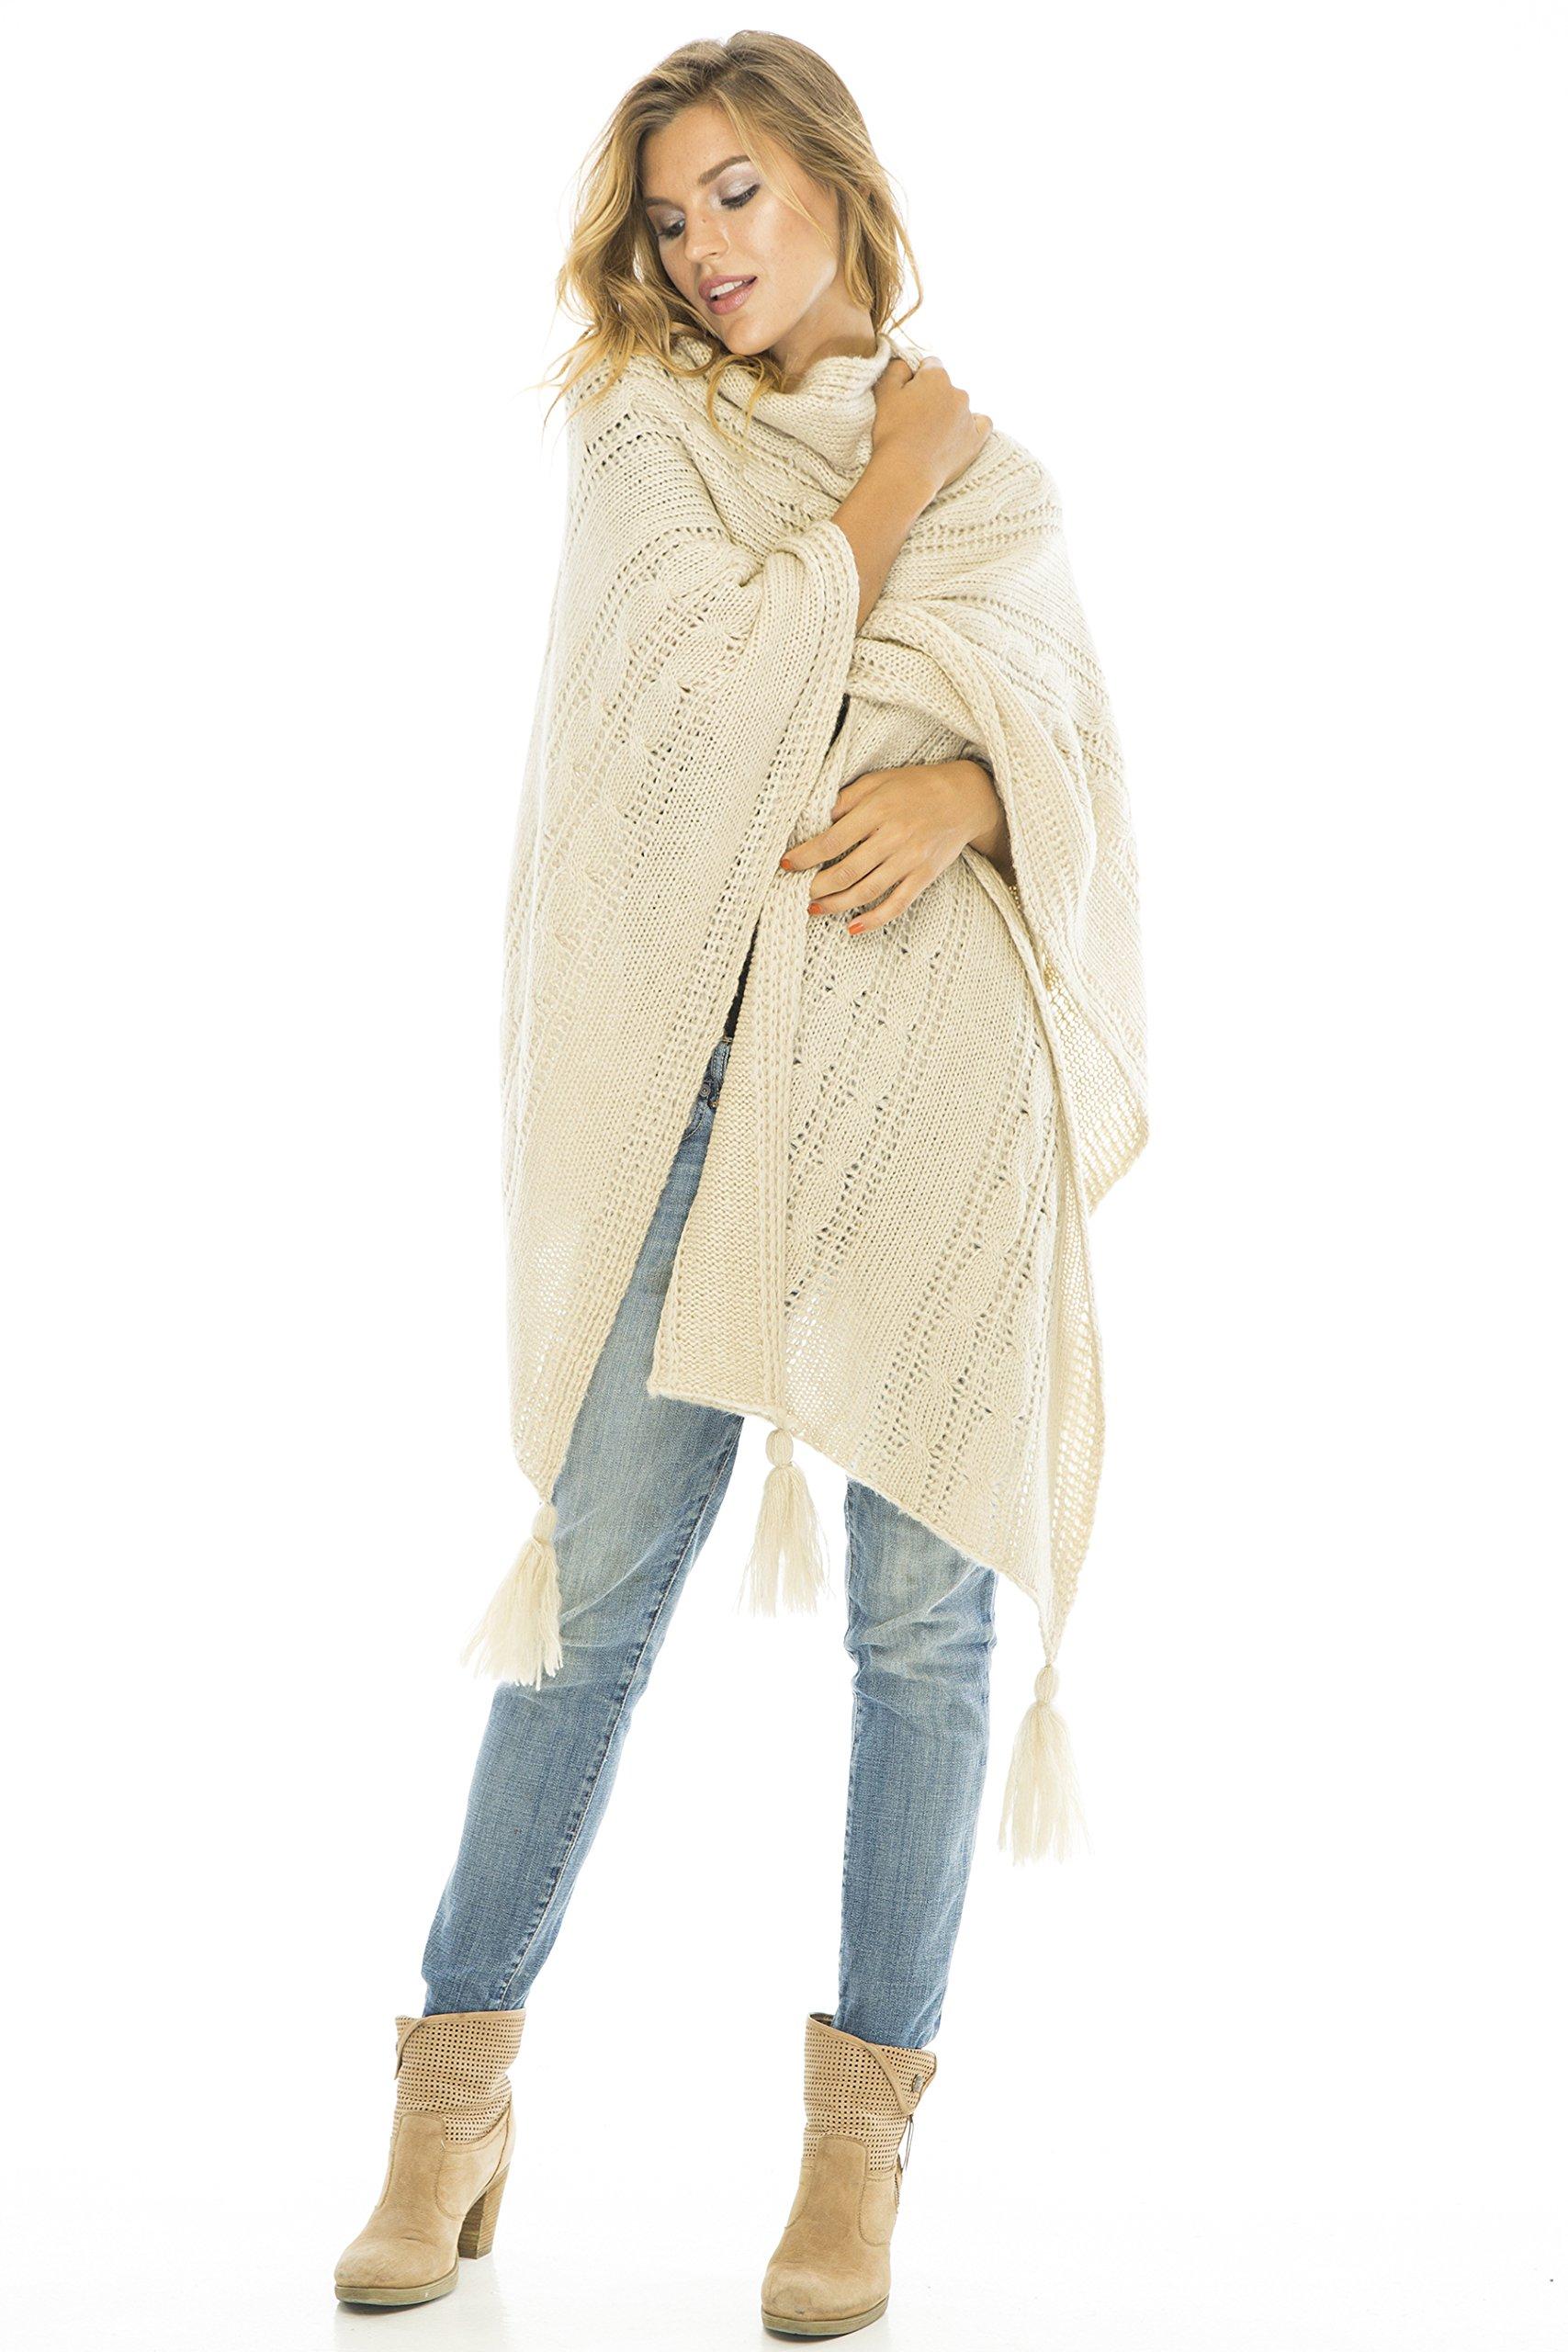 Back From Bali Wrap Cable Natural Cream Knit Wrap Shawl Long Poncho Sweater Boho Soft Tassel Fringe